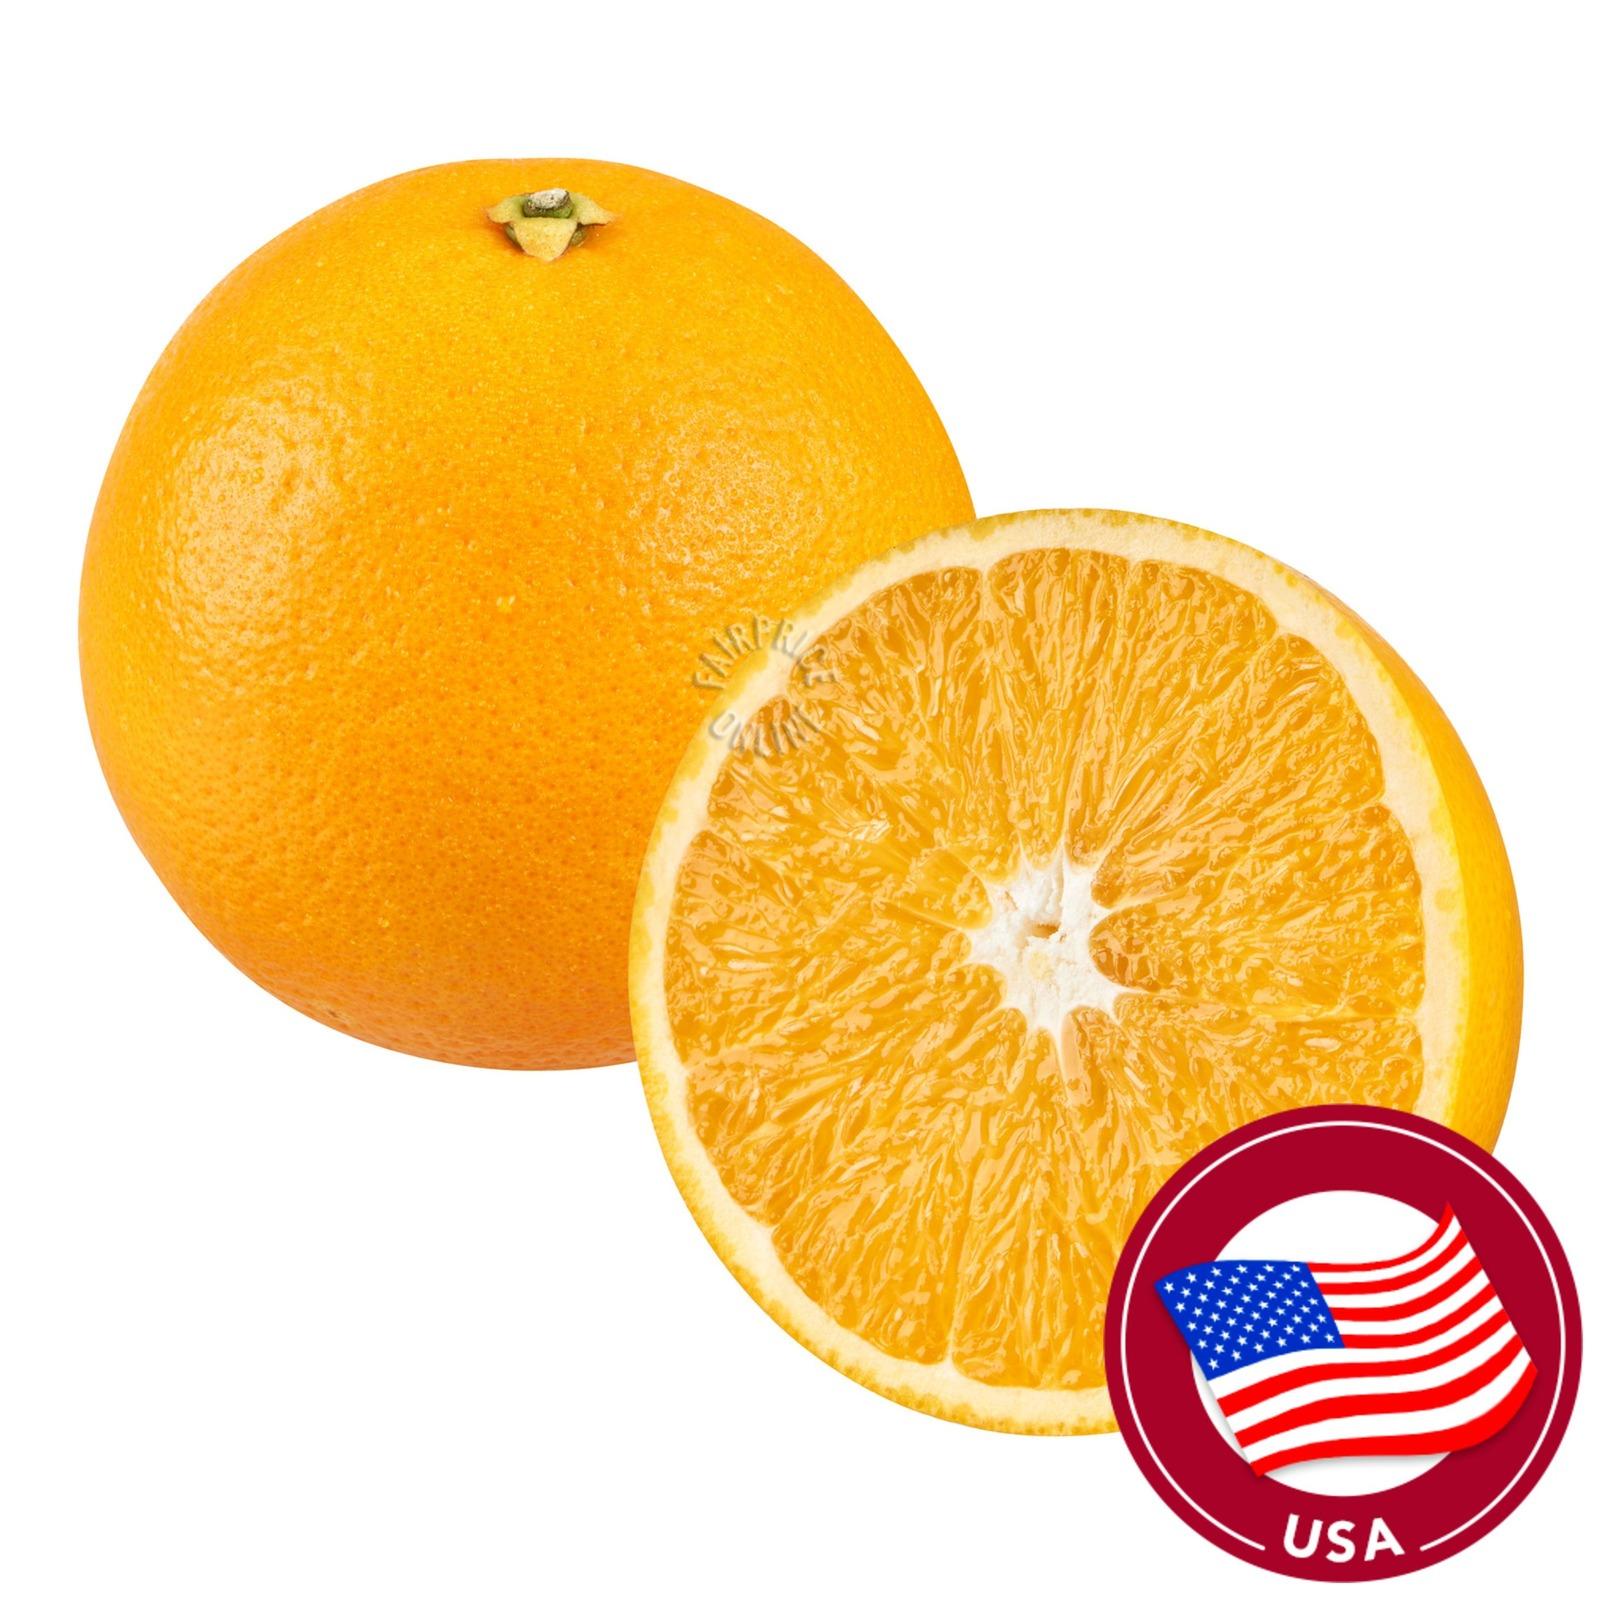 Sunkist USA Navel Oranges